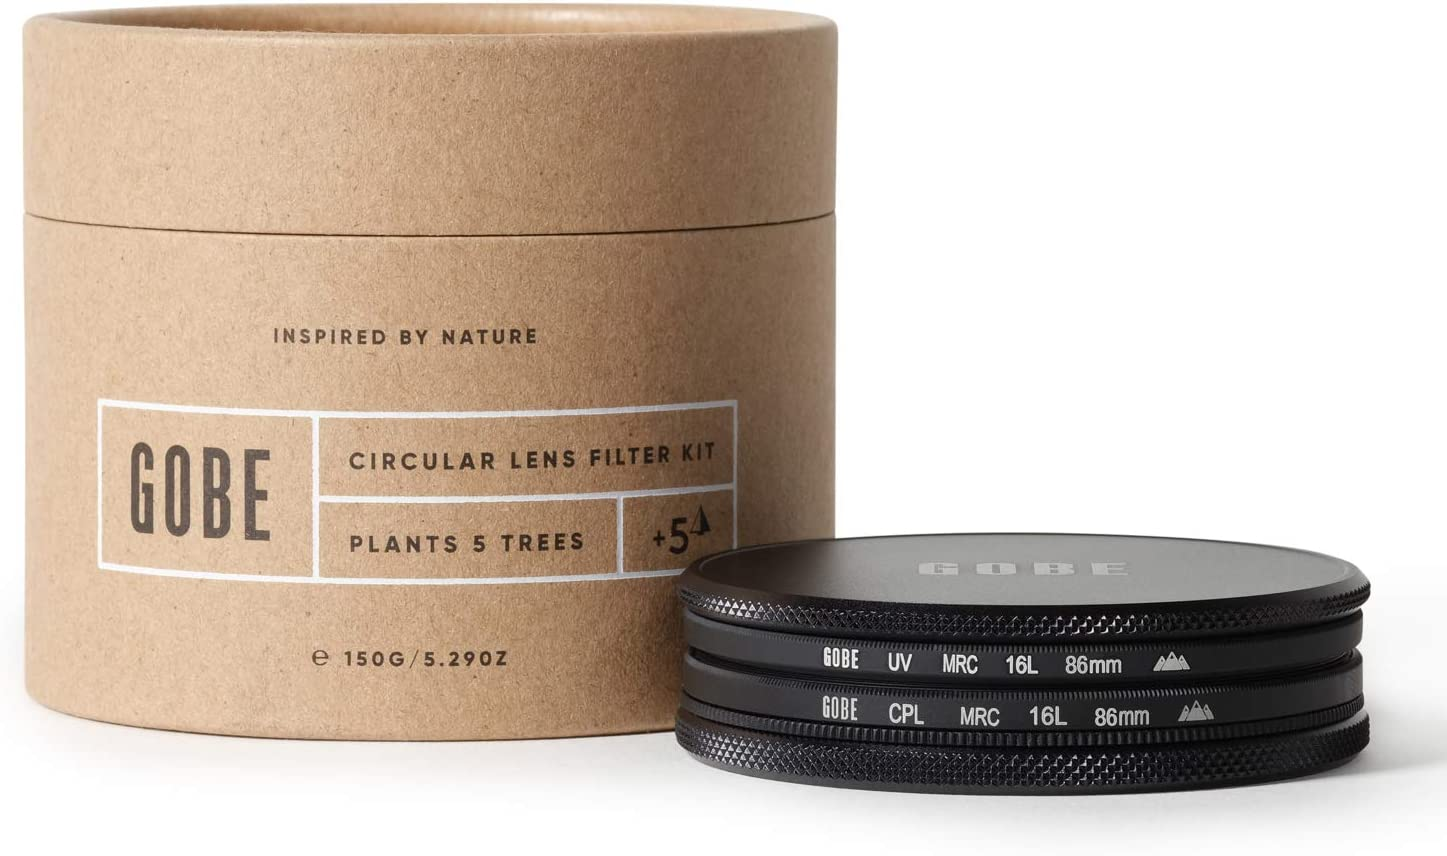 Gobe 86mm UV + Circular Polarizing (CPL) Lens Filter Kit (3Peak)